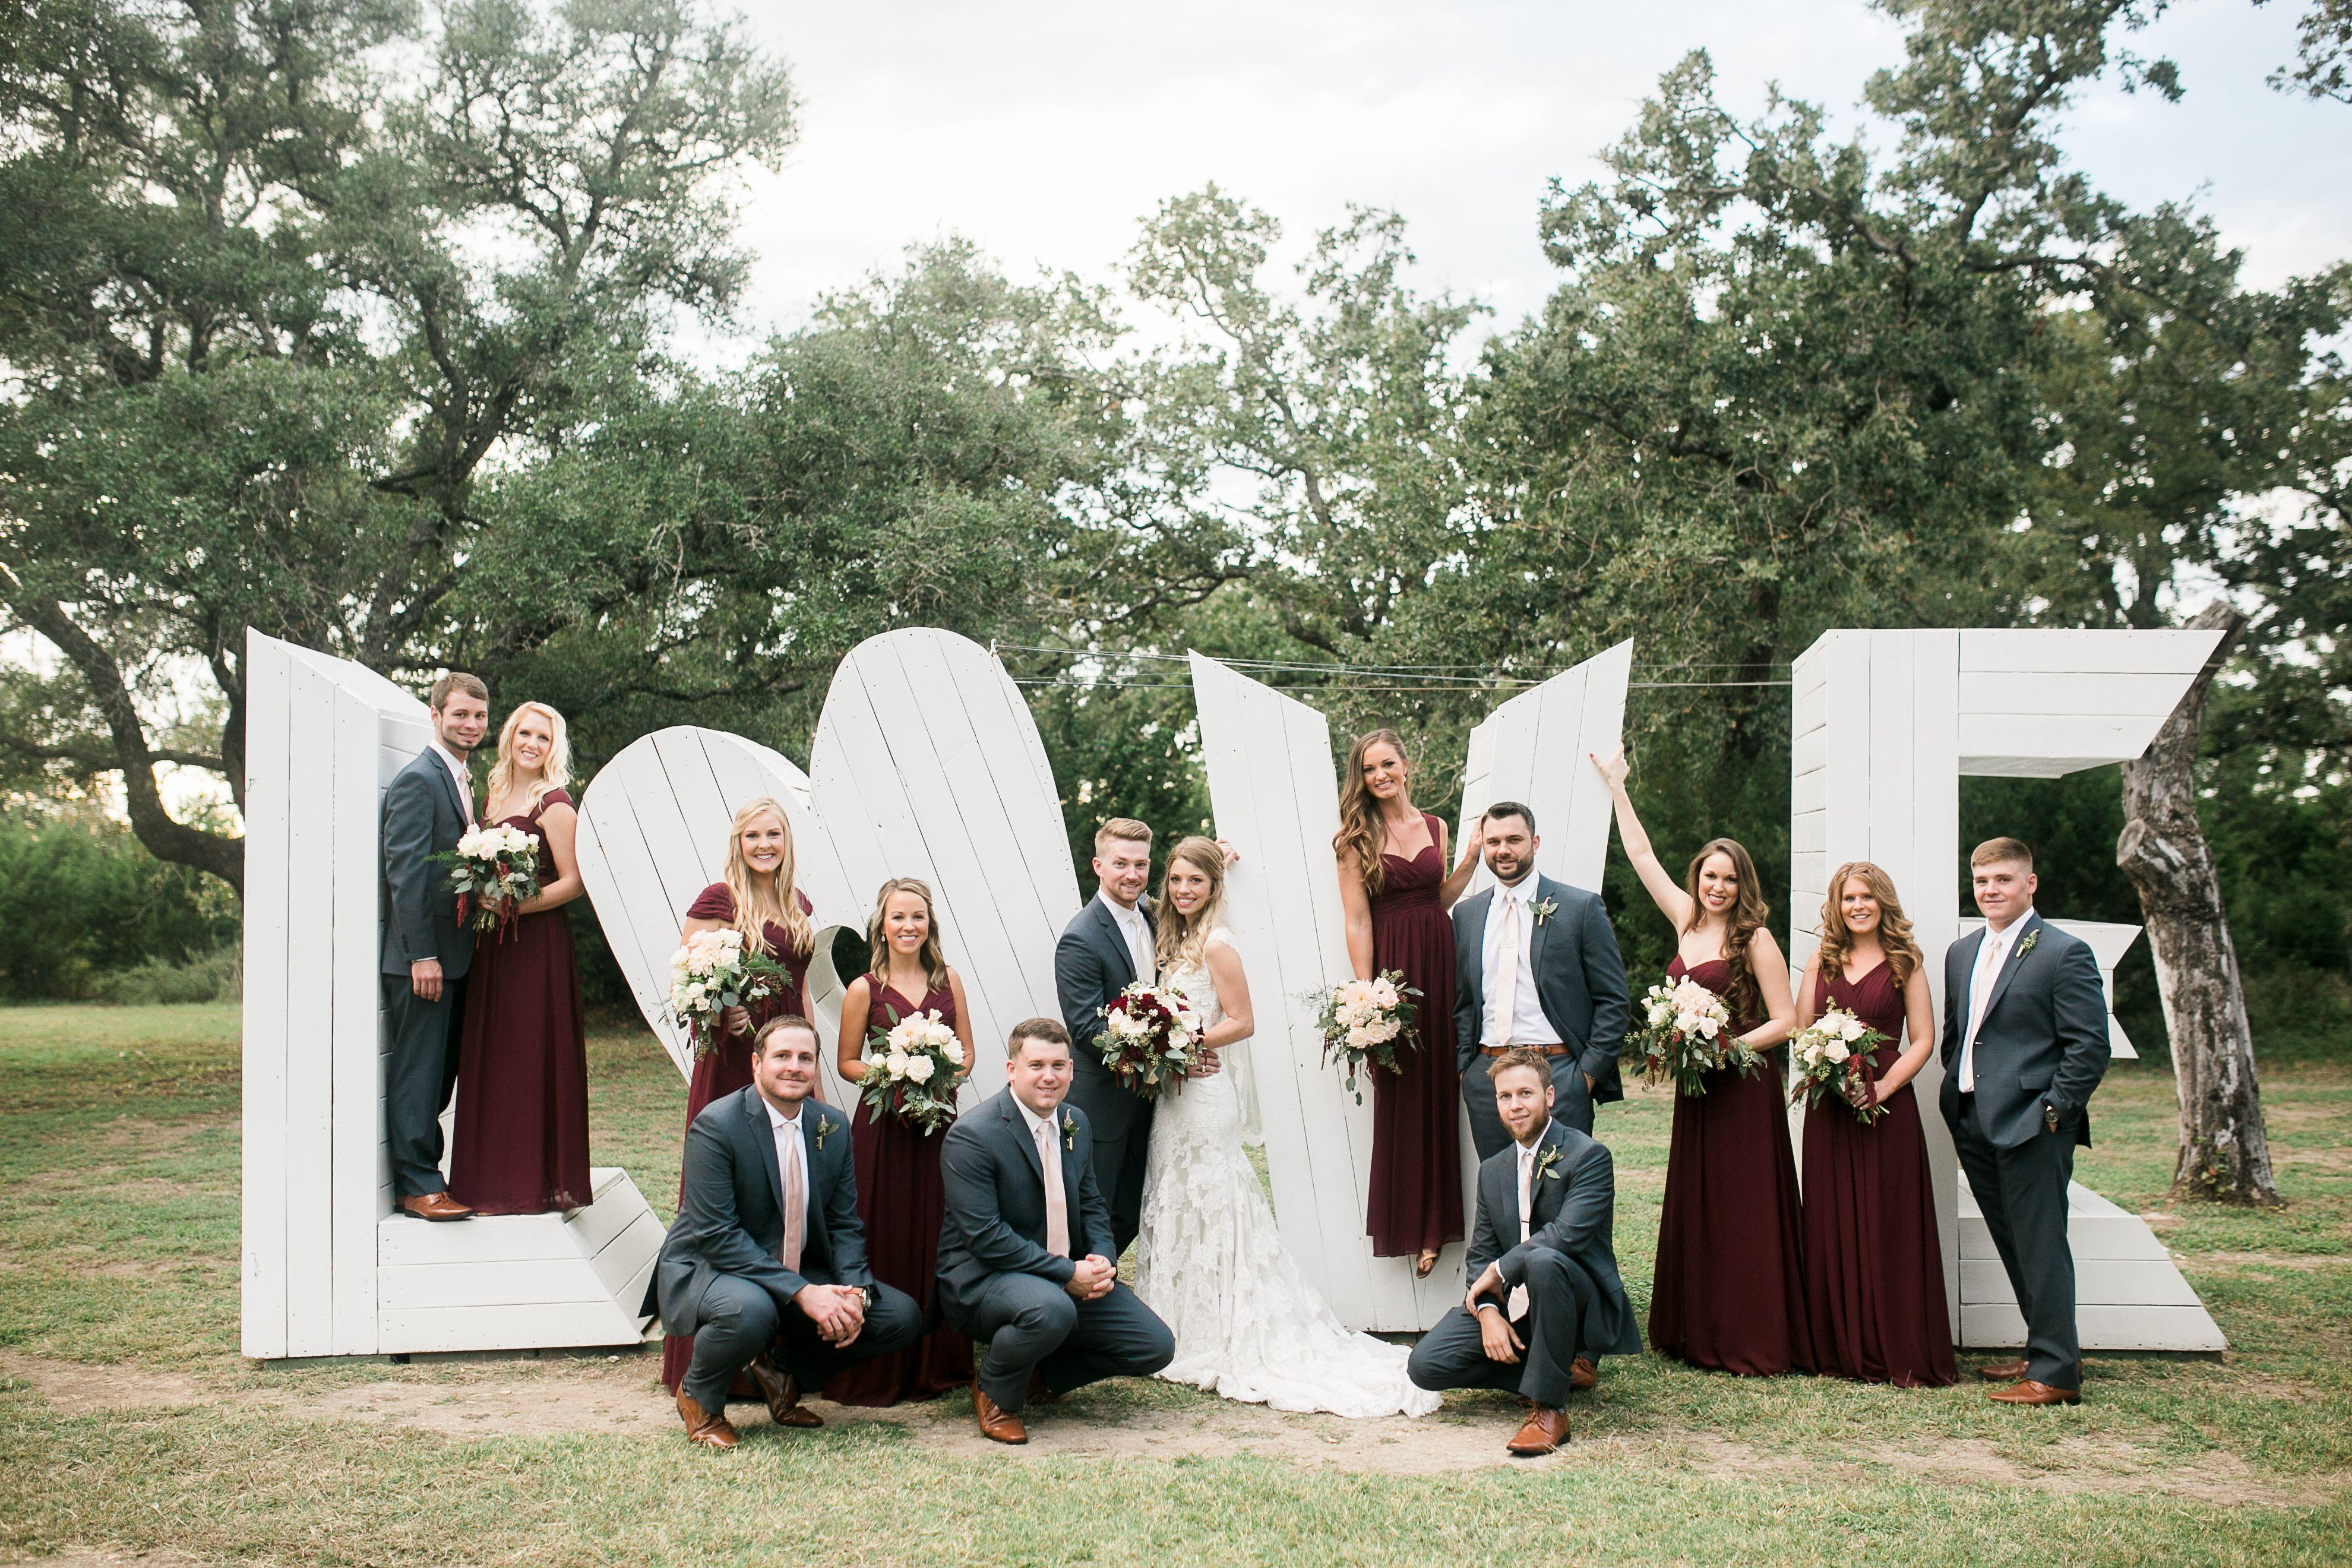 lista de poses de fotografía de boda